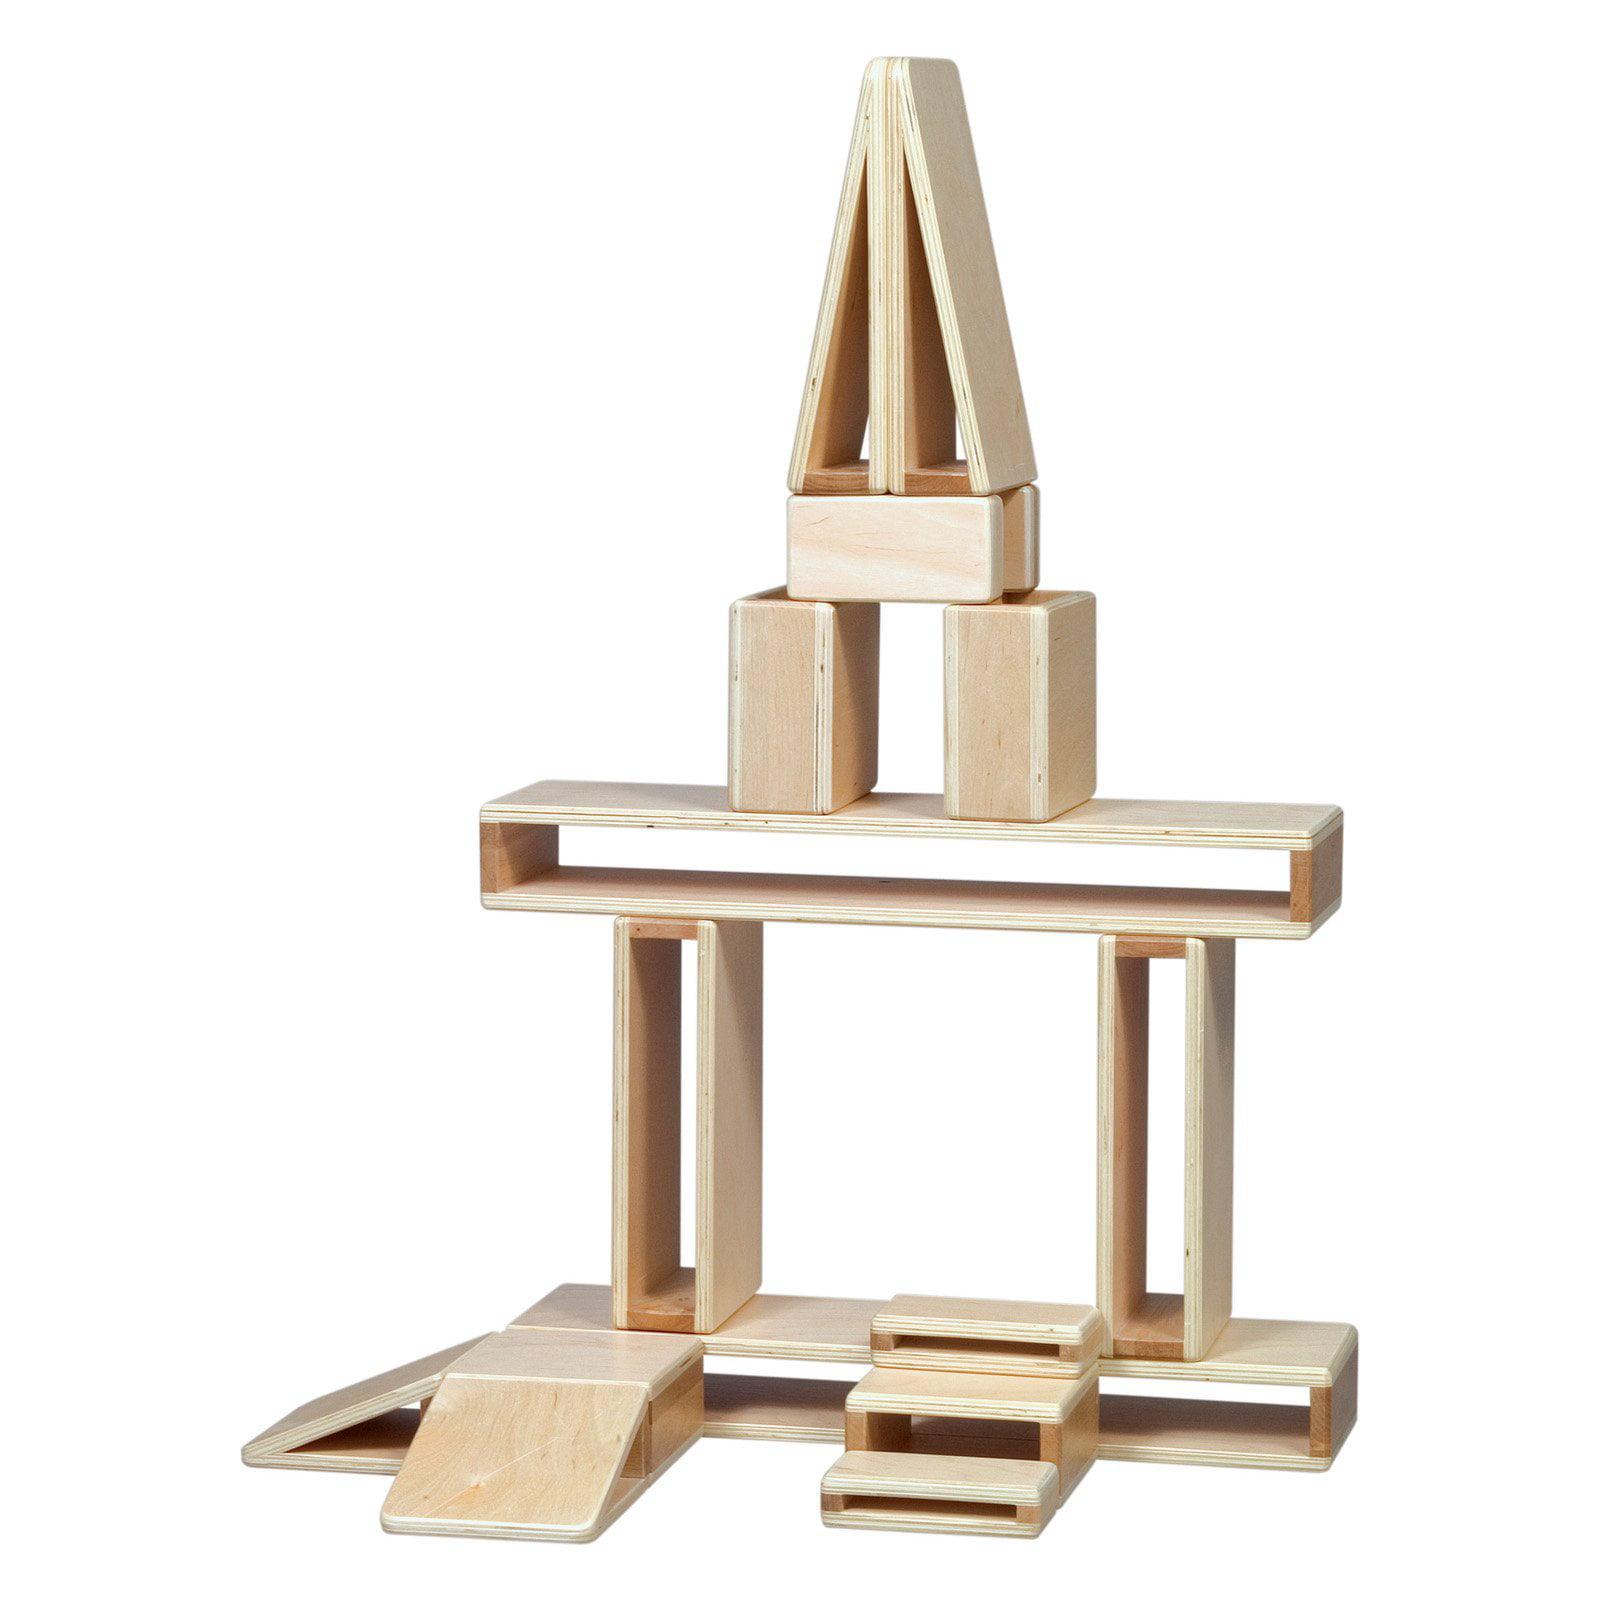 Guidecraft Mini Hollow Blocks, Set of 16